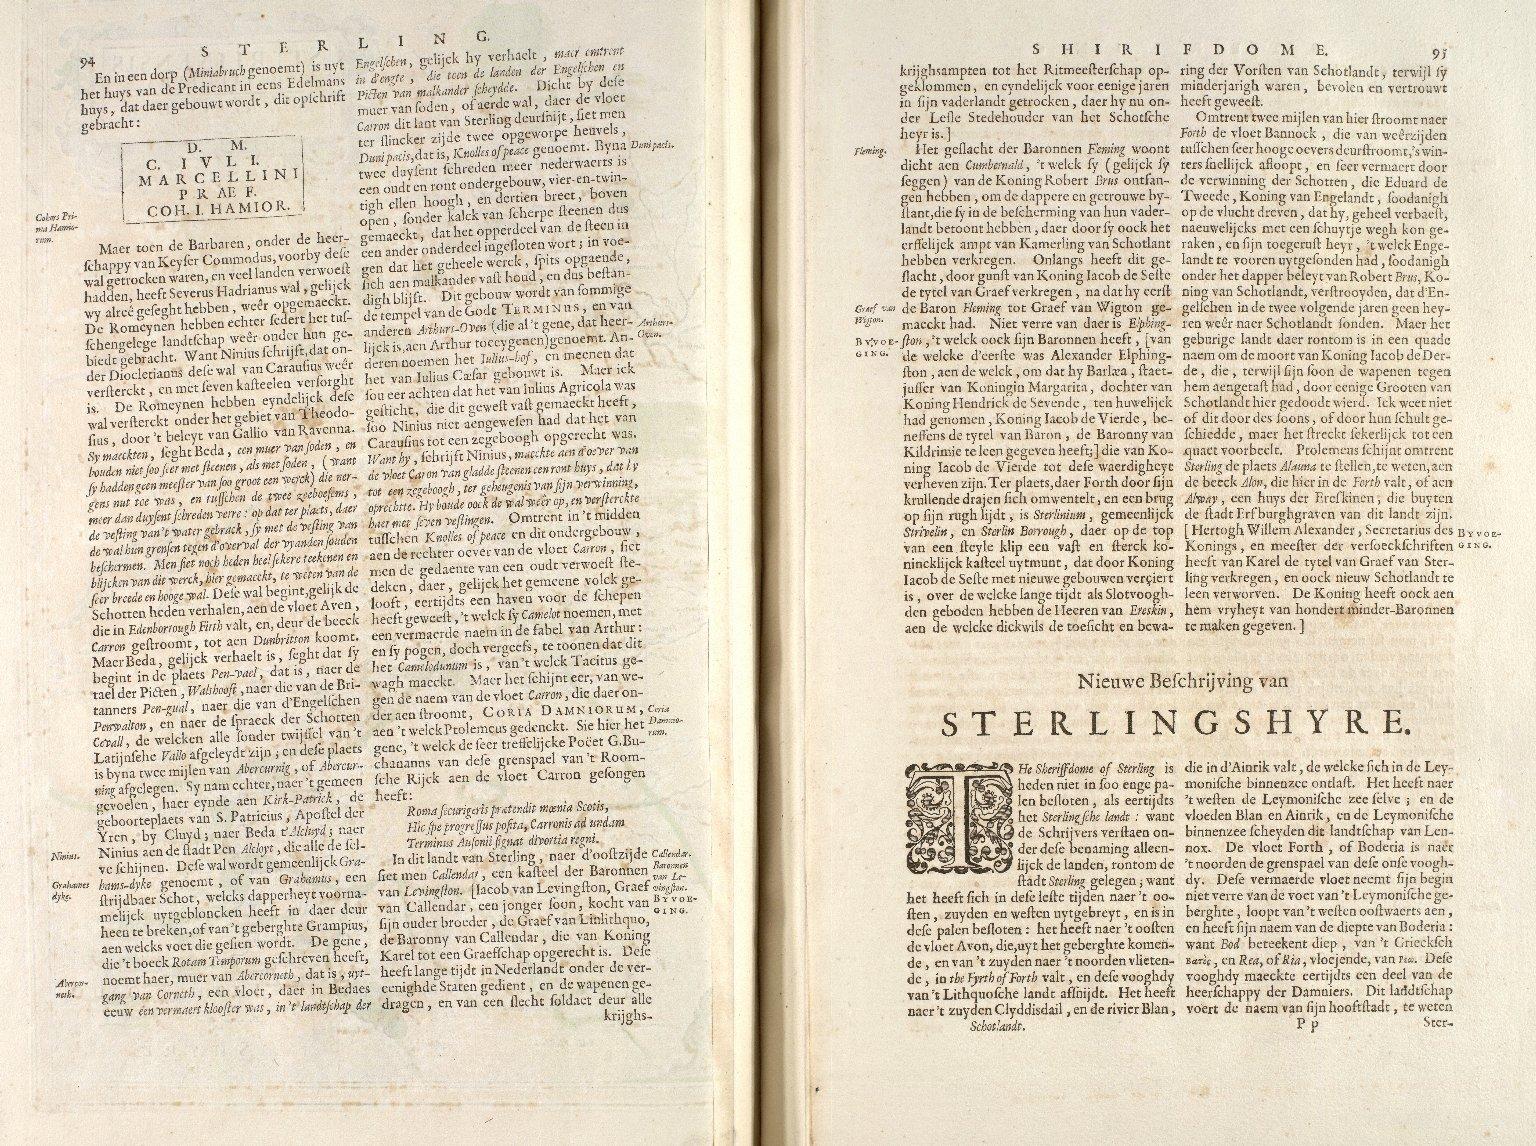 [Geographiae Blavianae] [Also known as: Atlas major] [085 of 153]